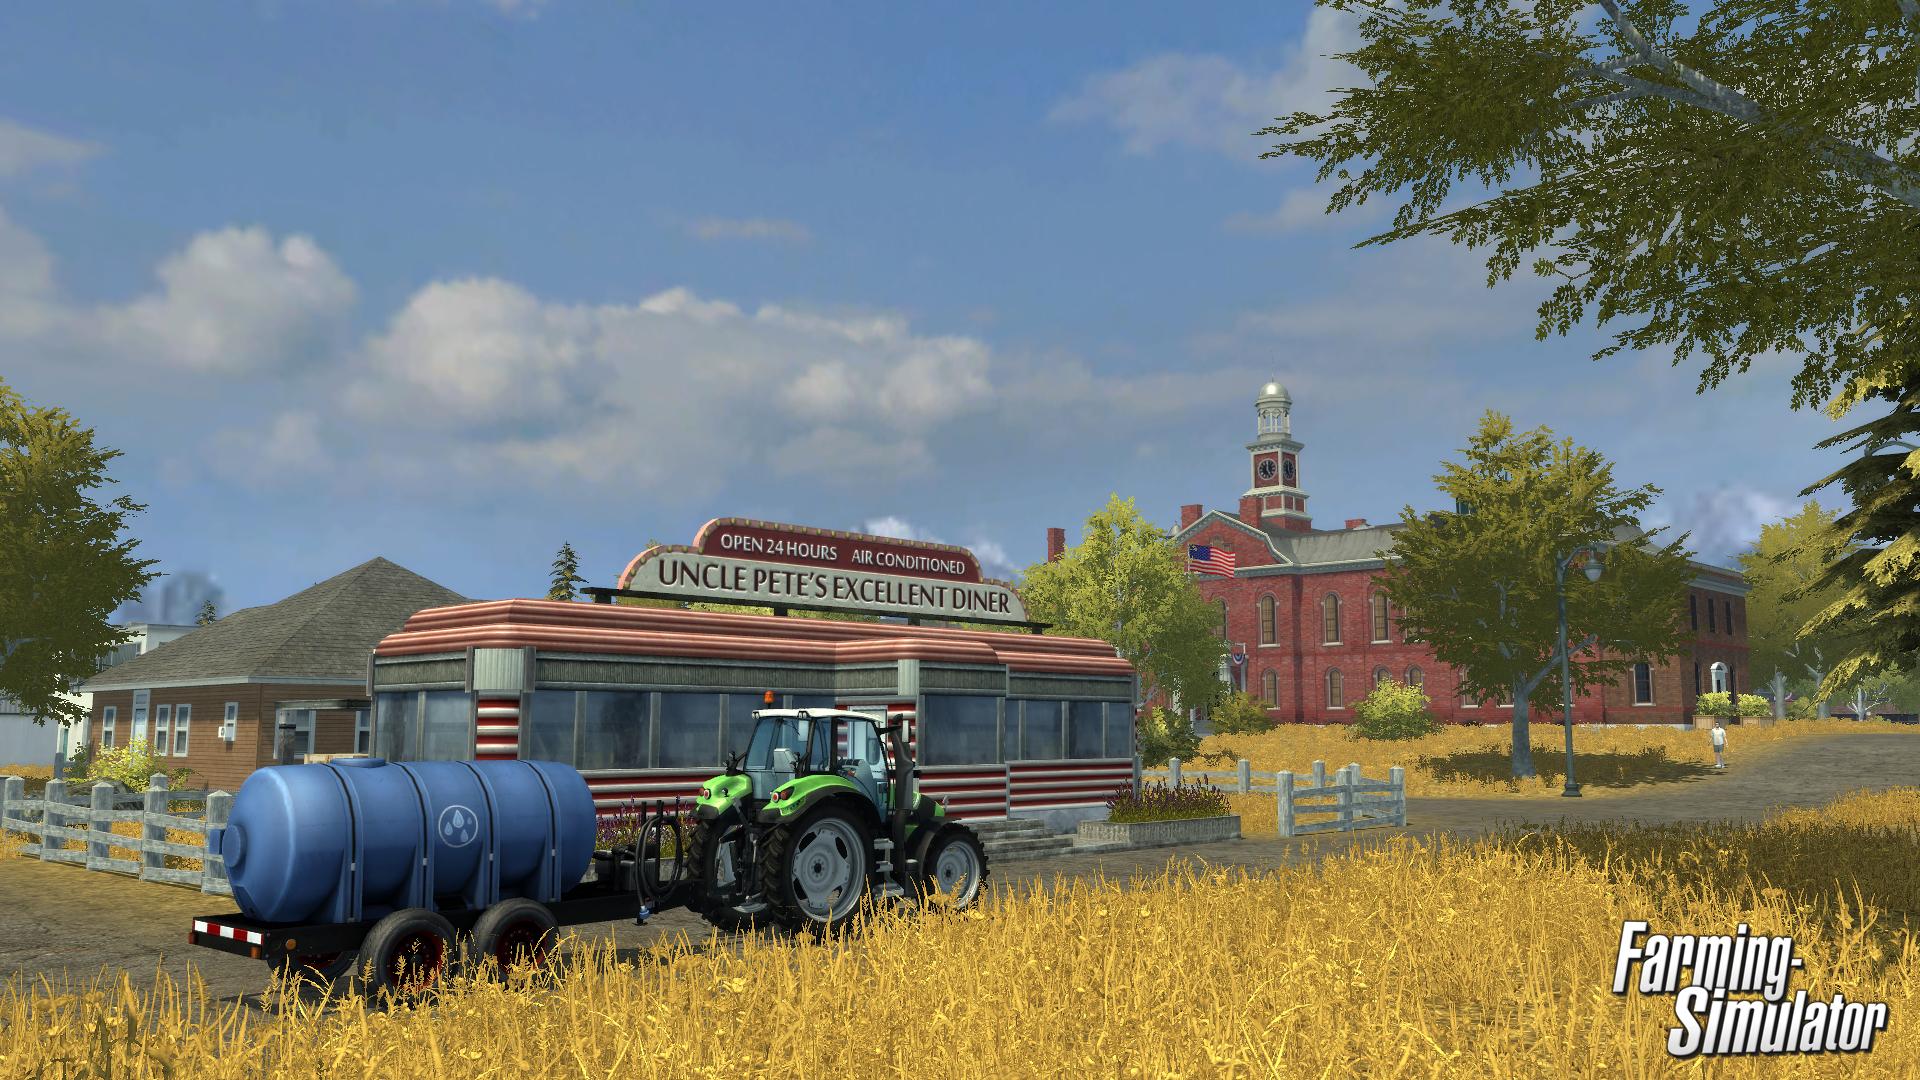 Farming Simulator Coming On Consoles!